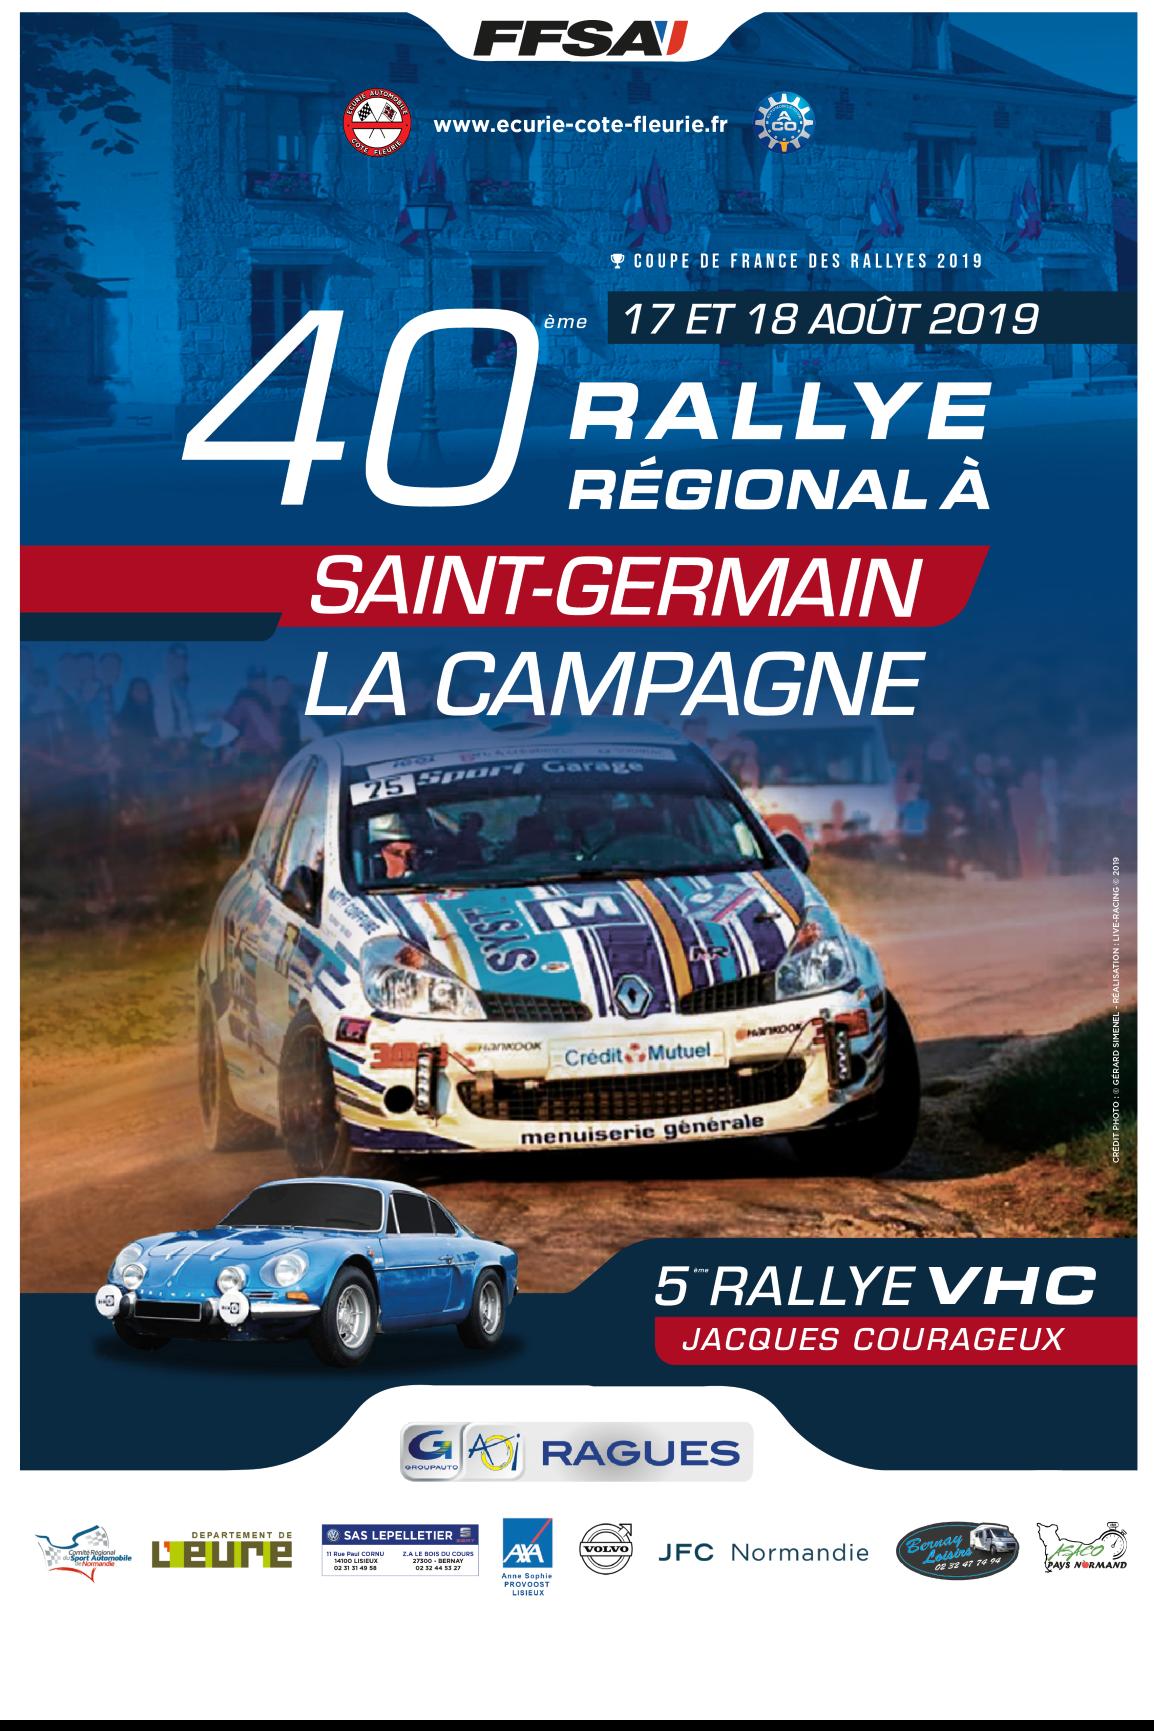 Rallye-ST-Germain-2019.18.png